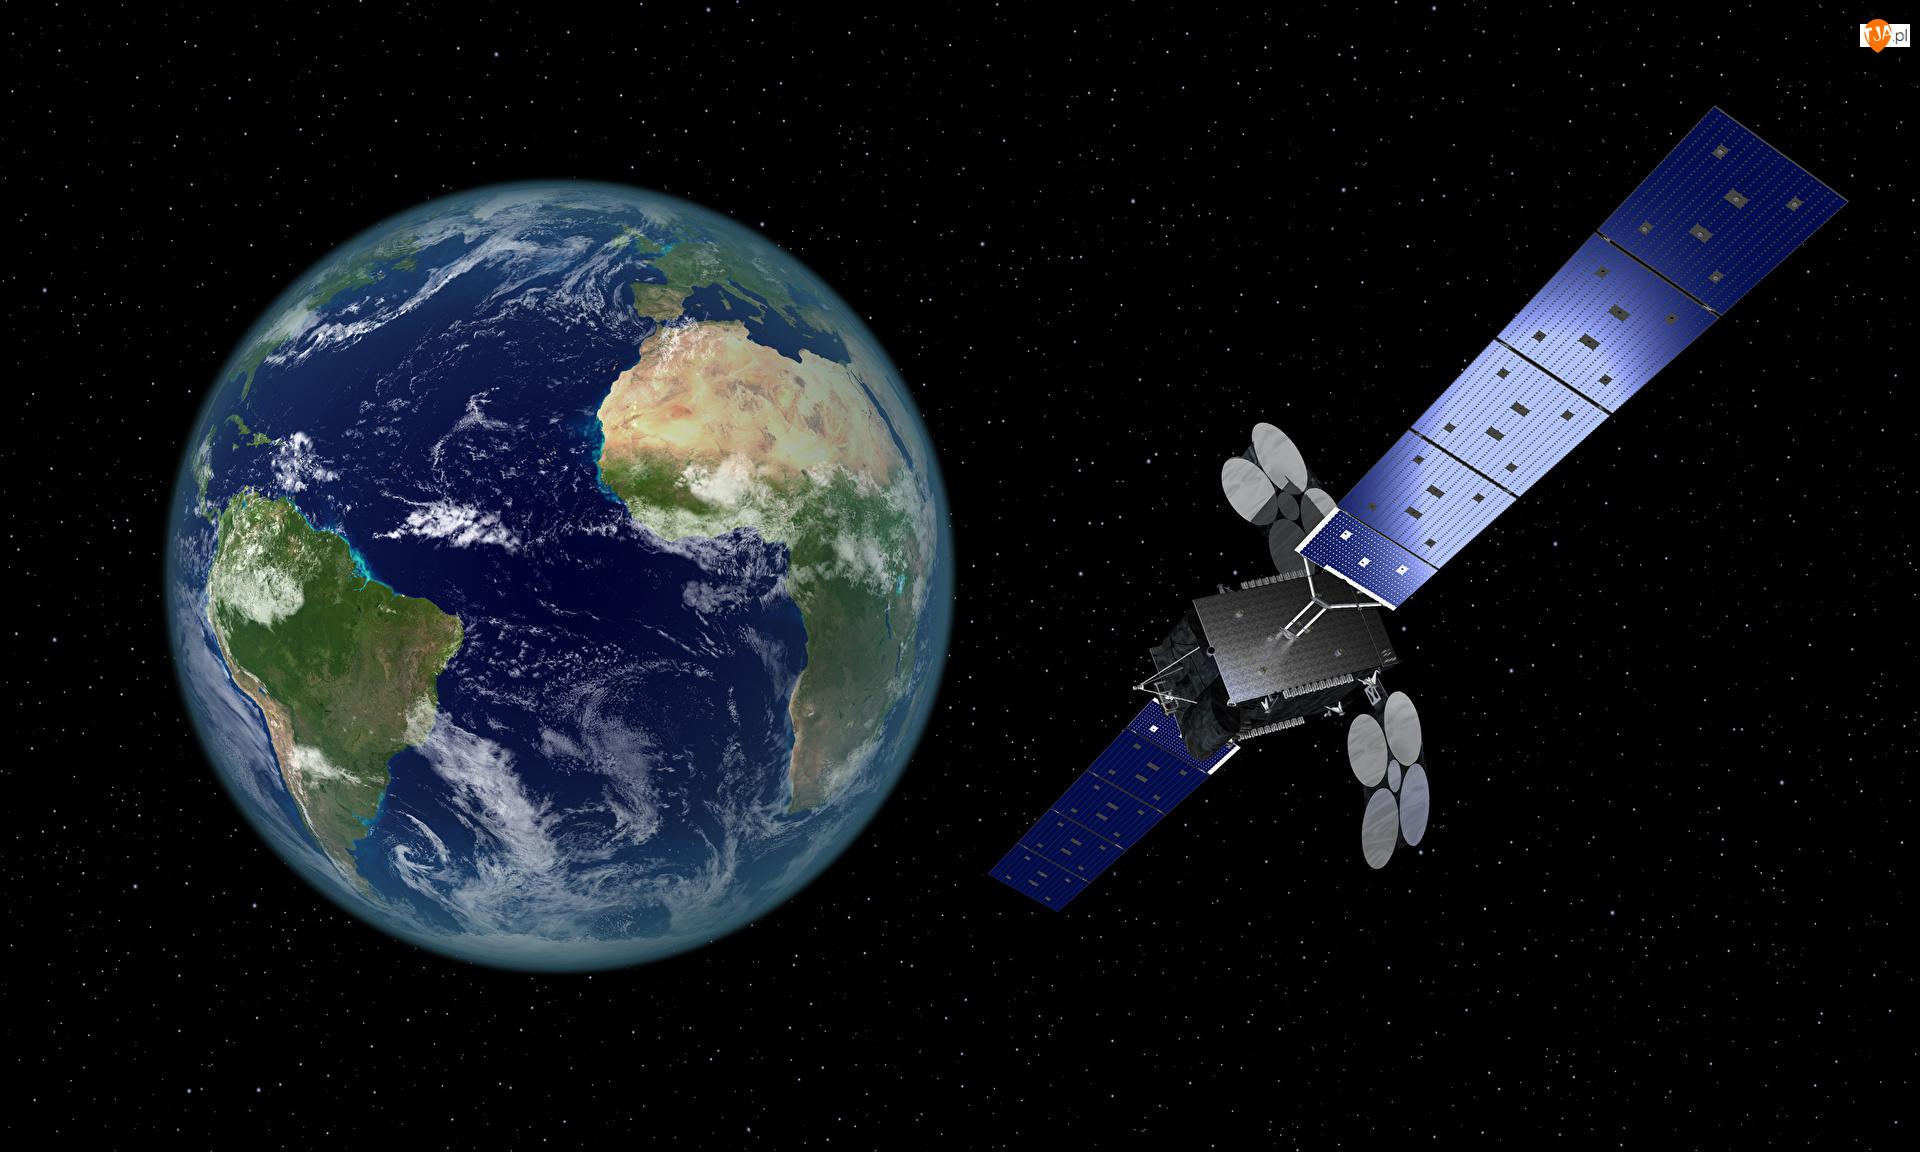 Satelita telekomunikacyjny Al Yah 3, Grafika 3D, Ziemia